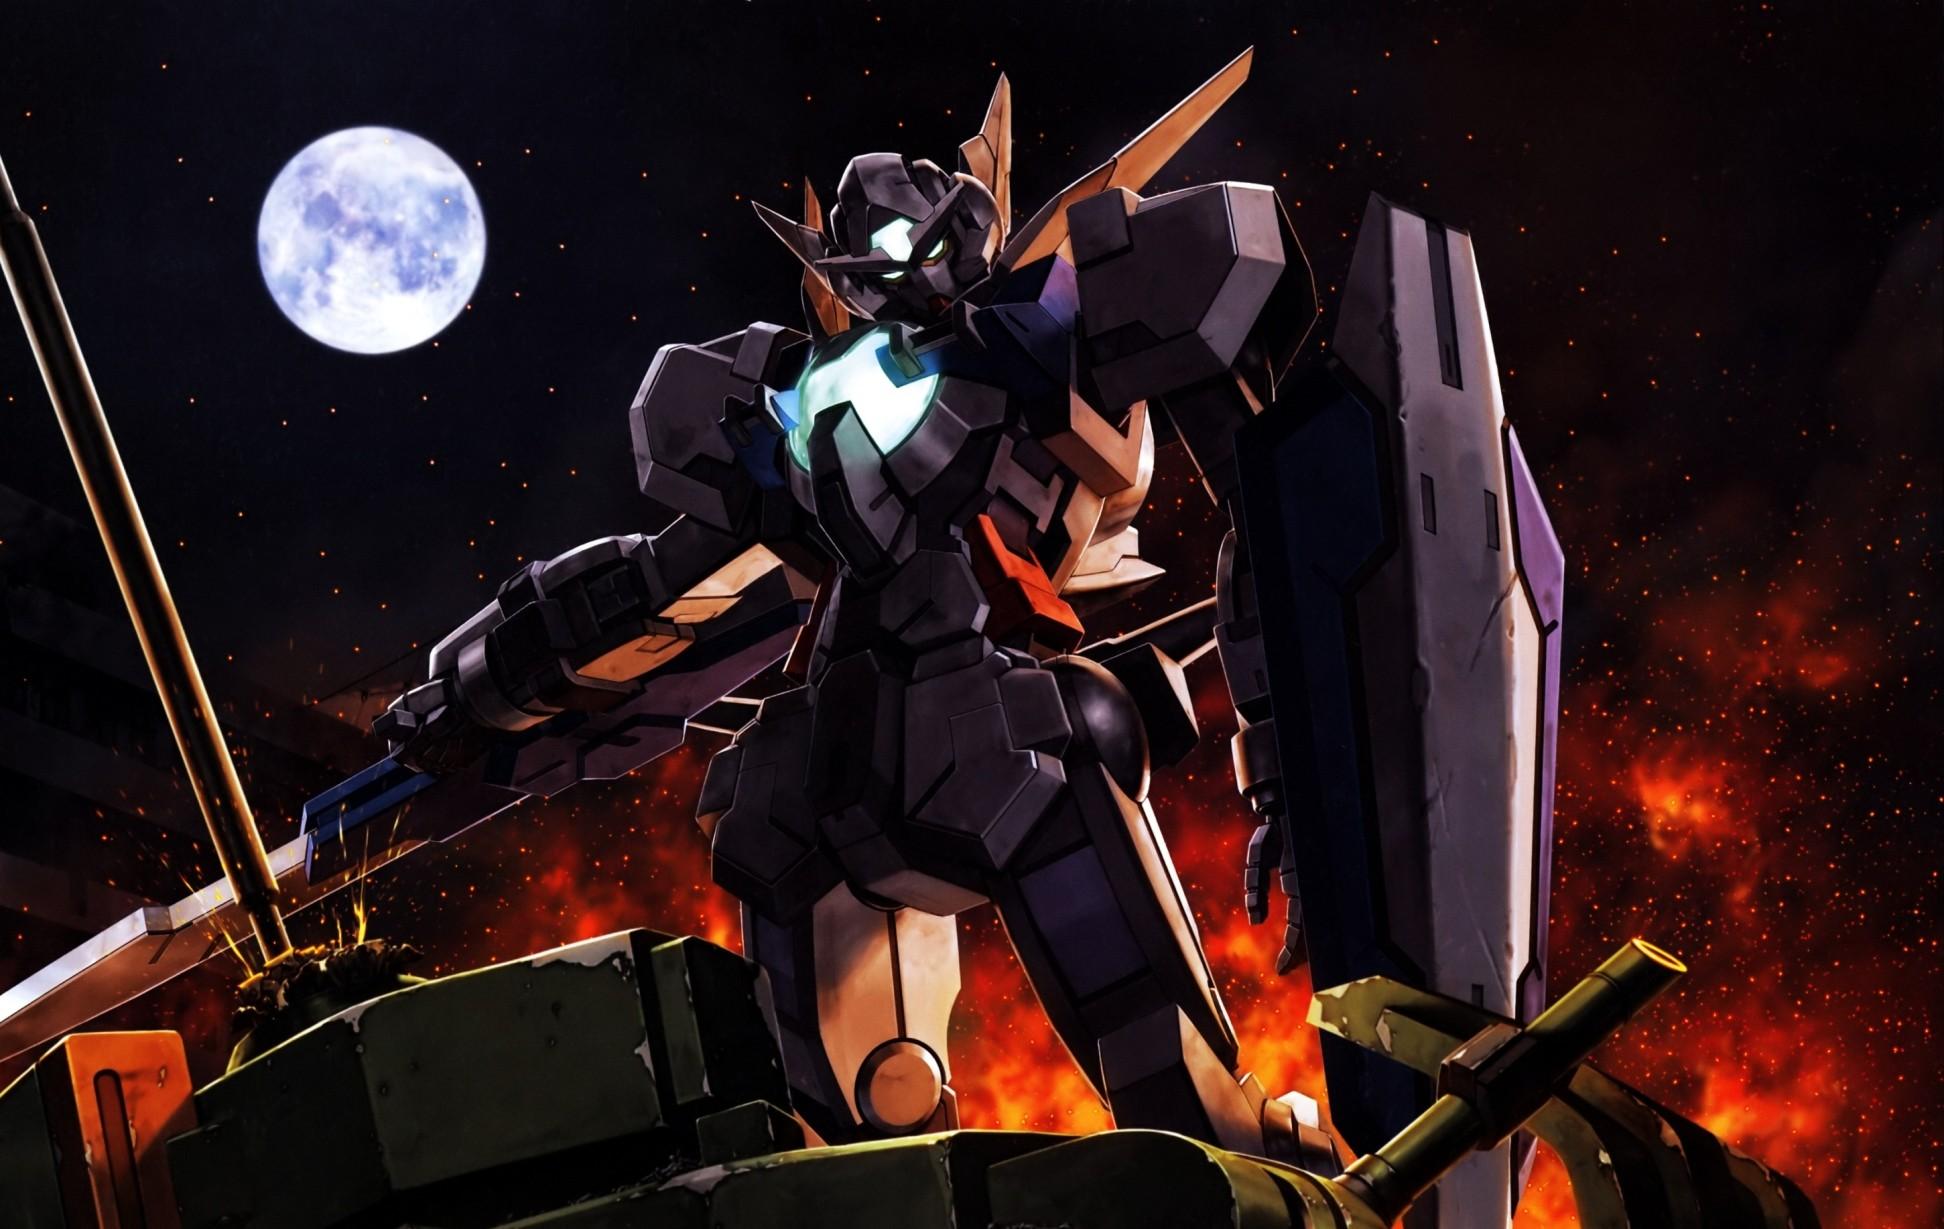 Download Gundam Wallpaper 1944x1229 Wallpoper 273173 1944x1229